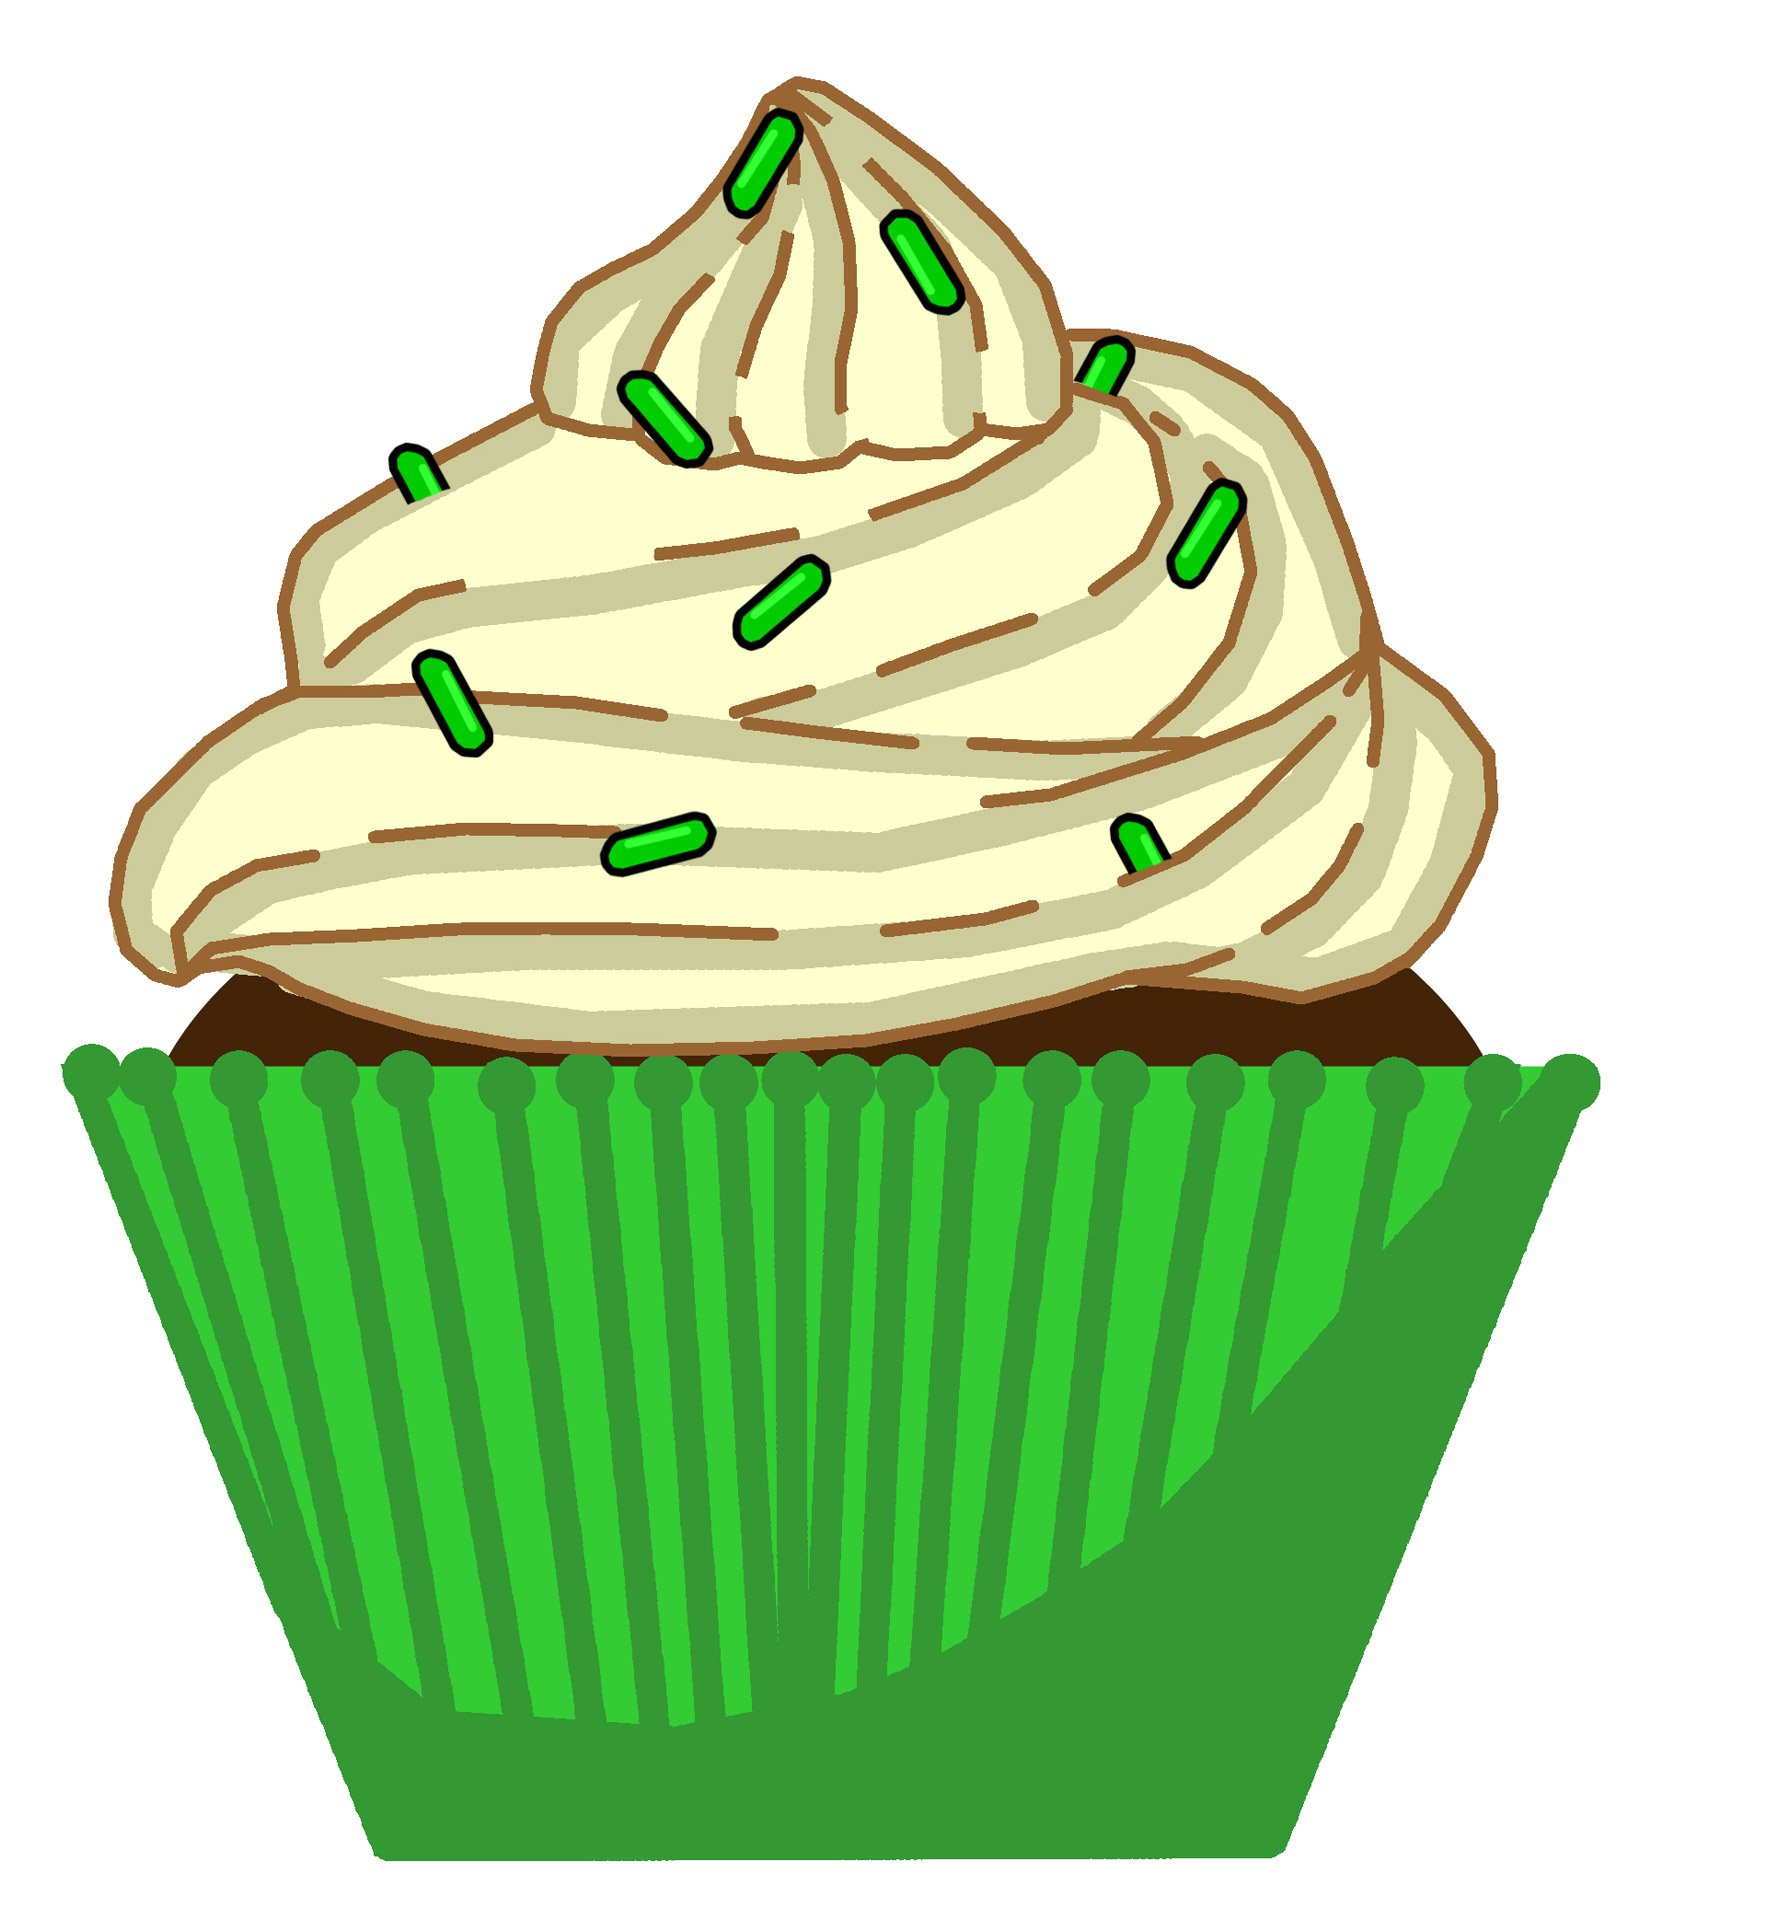 Green Mint Cupcake Free Stock Photo.